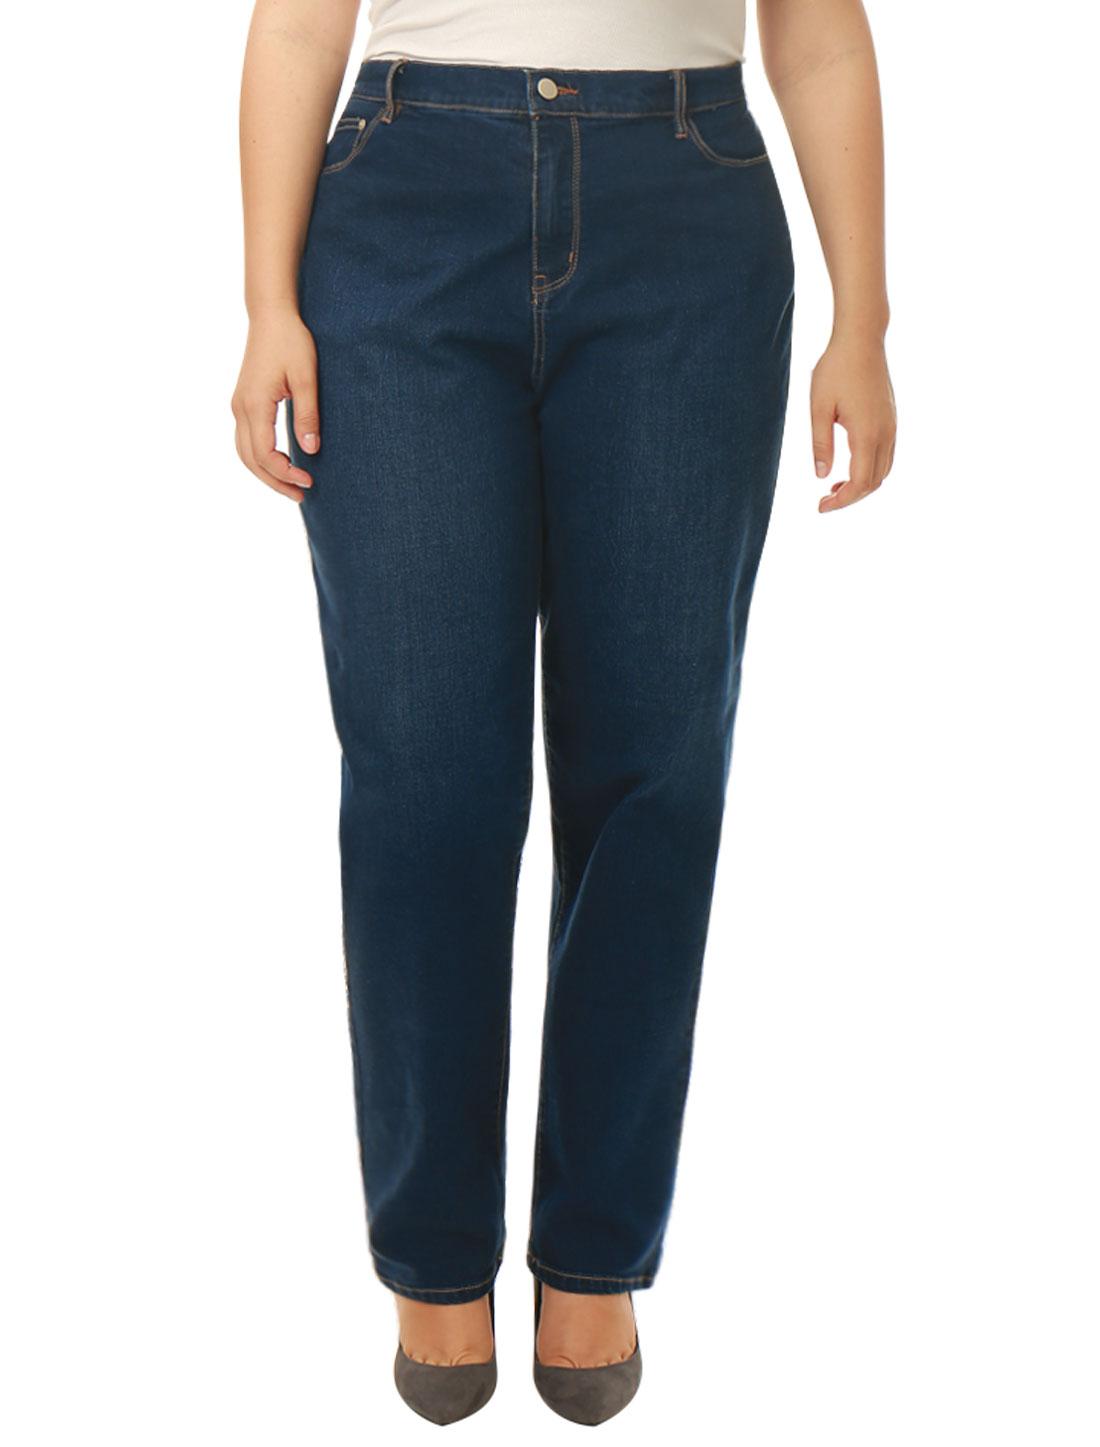 Women Plus Size Mid Rise Stretch Straight Leg Jeans Blue 3X